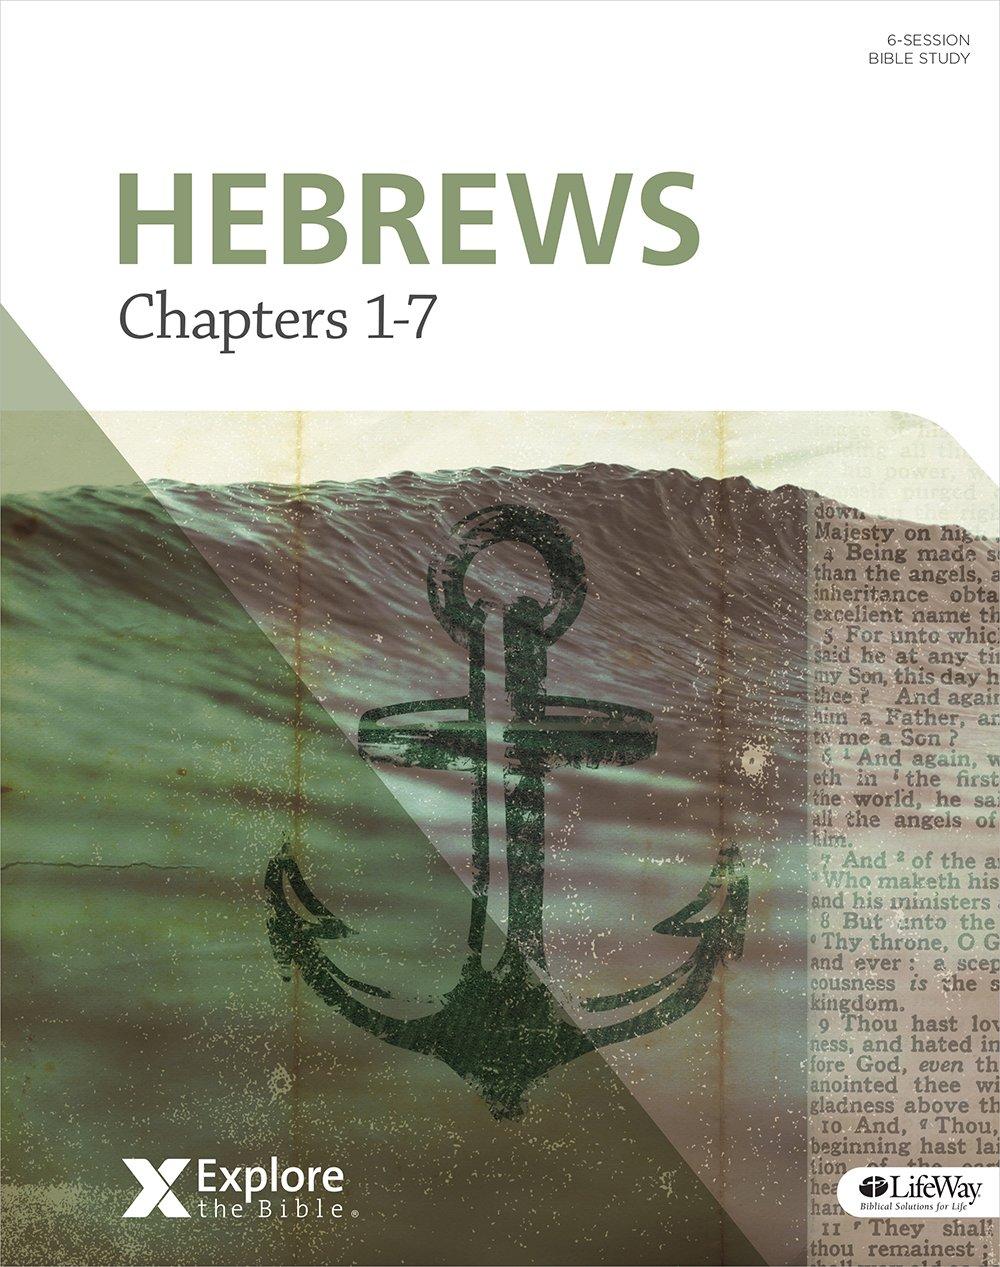 Download Explore the Bible: Hebrews: Chapters 1-7 - Bible Study Book pdf epub